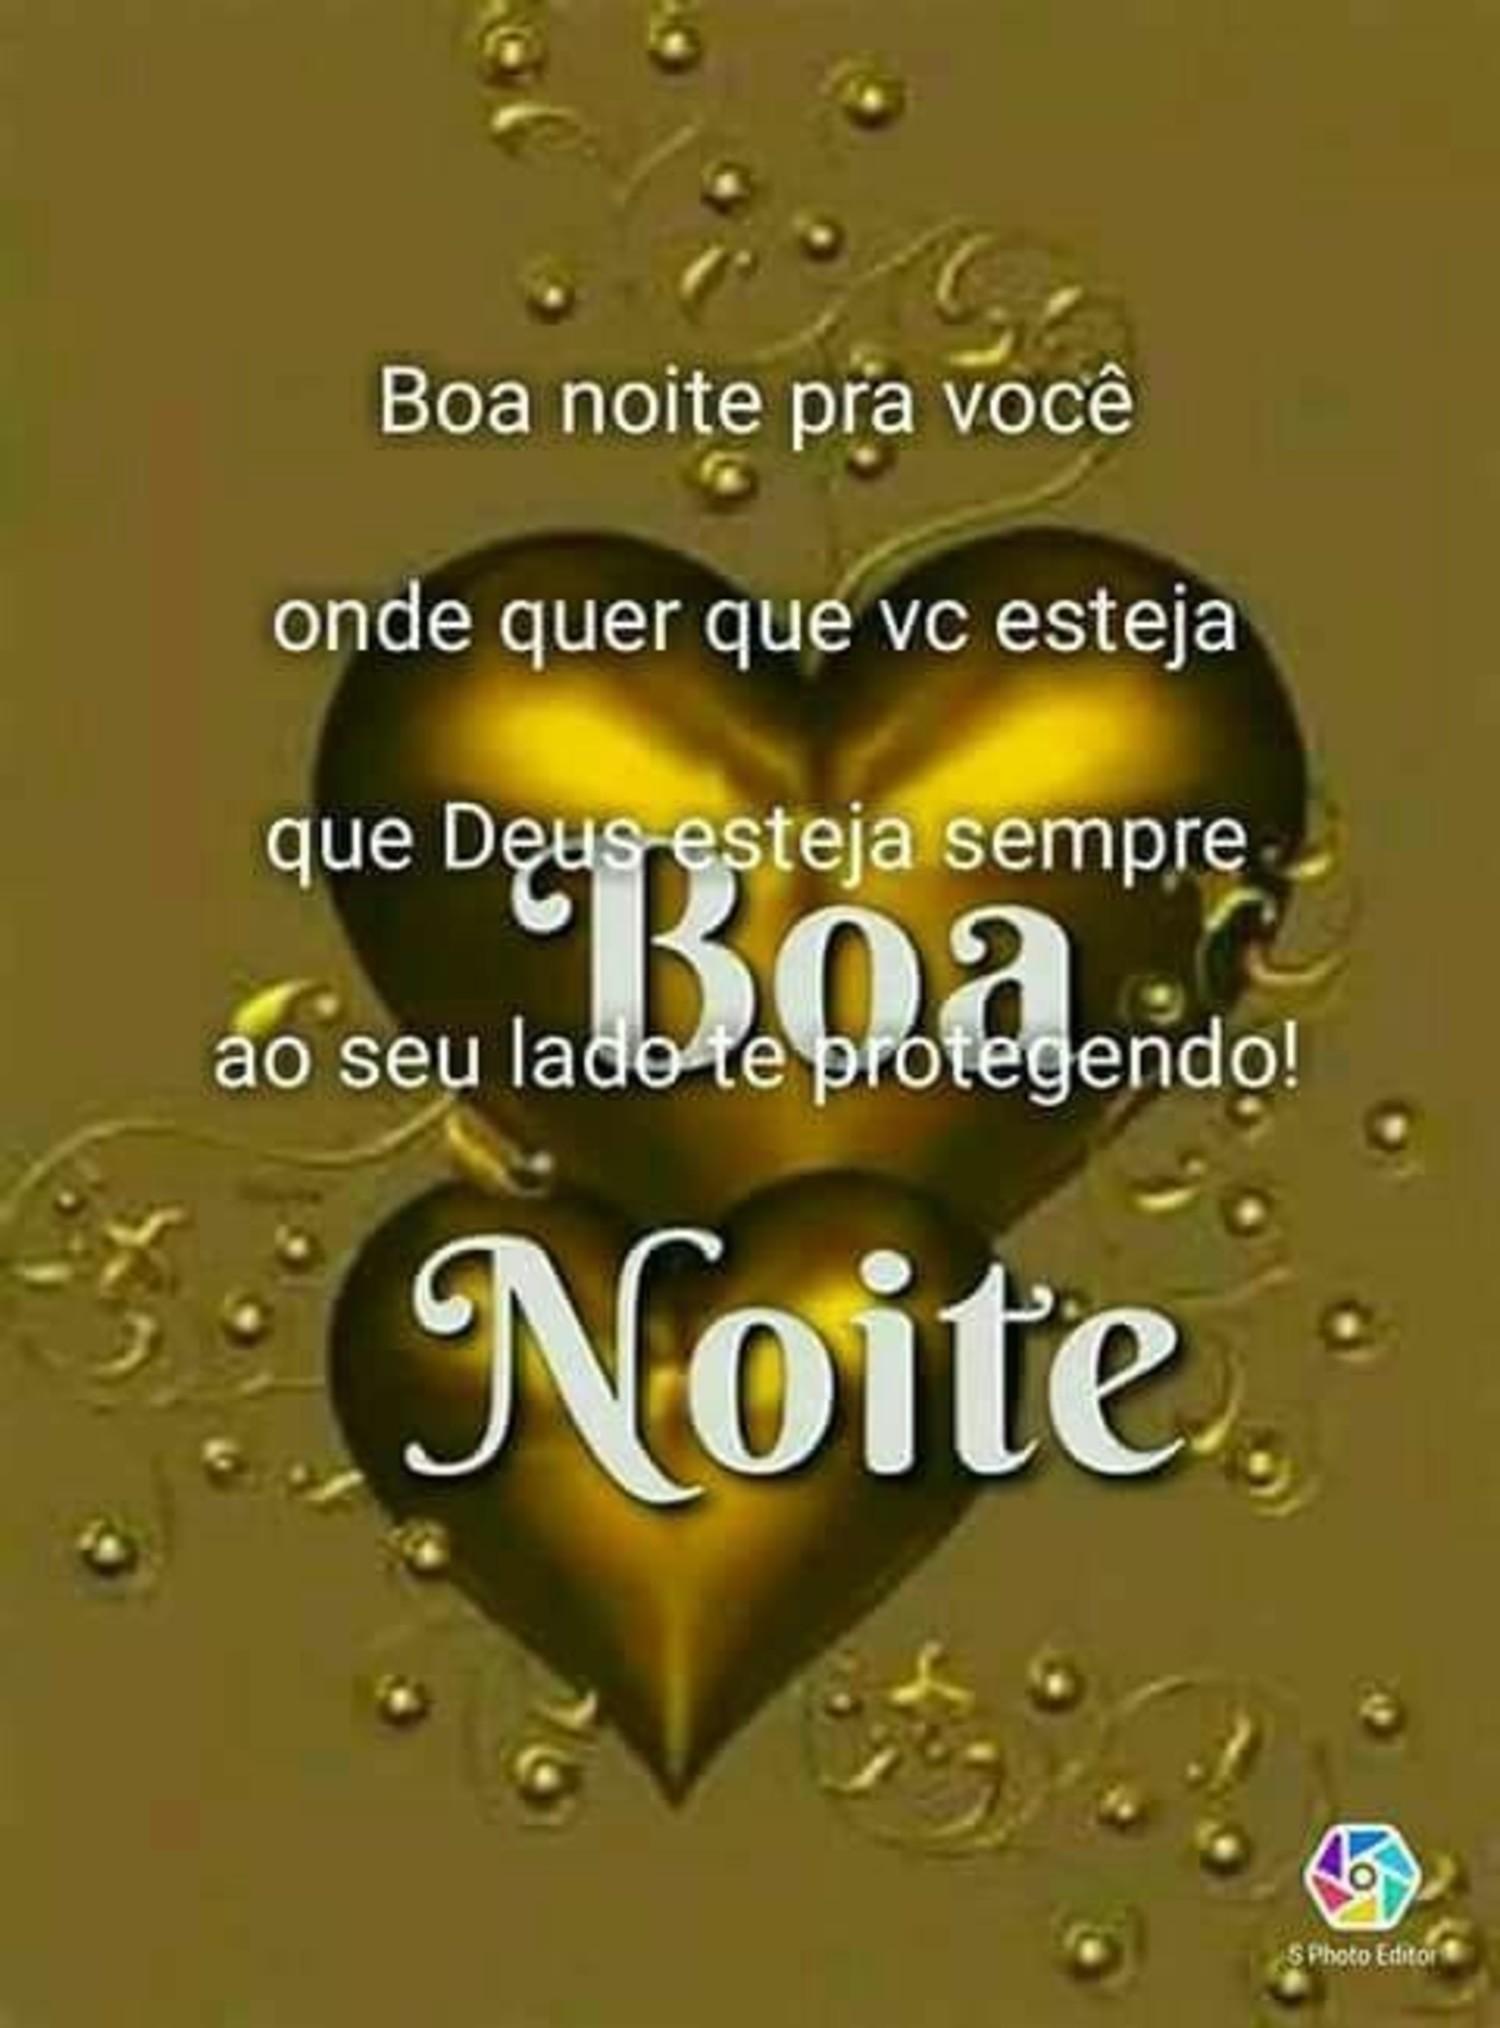 Boa Noite Whatsapp Imagens Imagensbomdianet